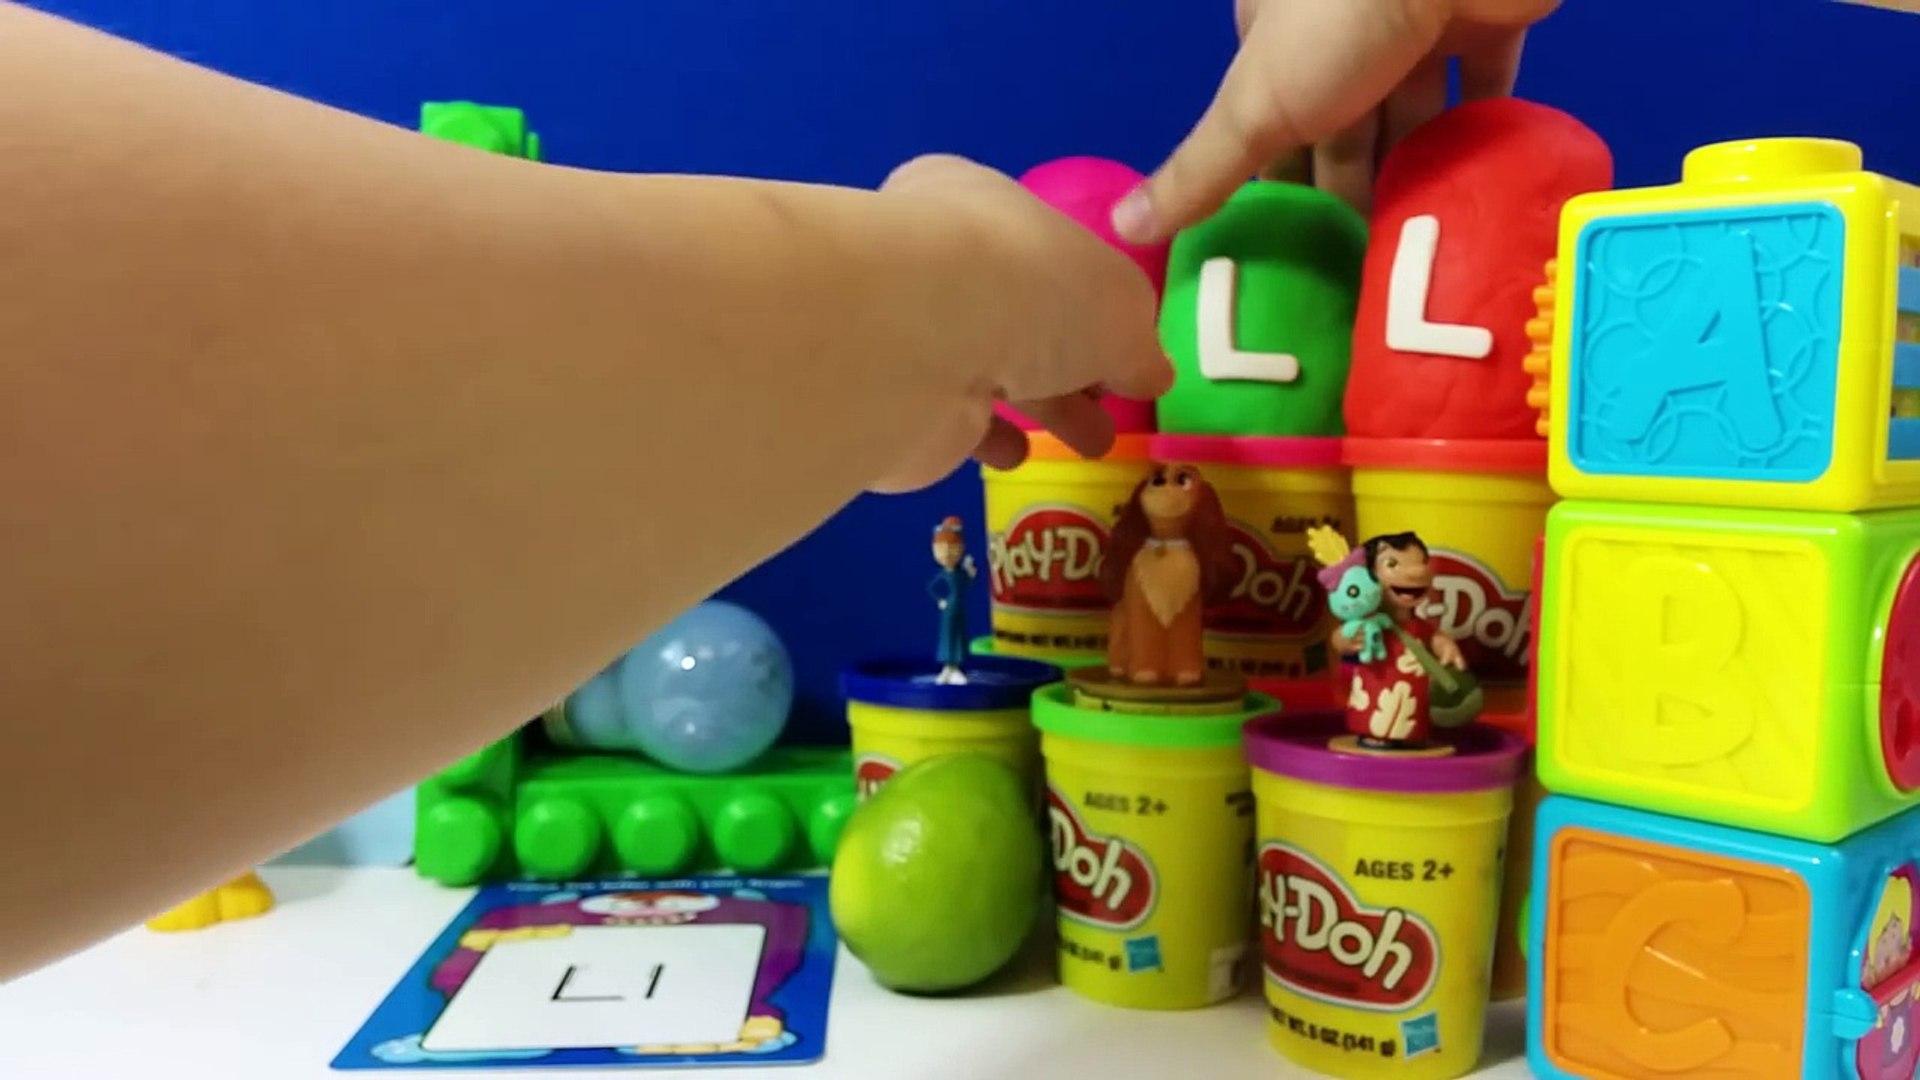 The Letter L with ABC Surprise Eggs - Luke Skywalker Lilo Lightning McQueen Lady Lapras Th